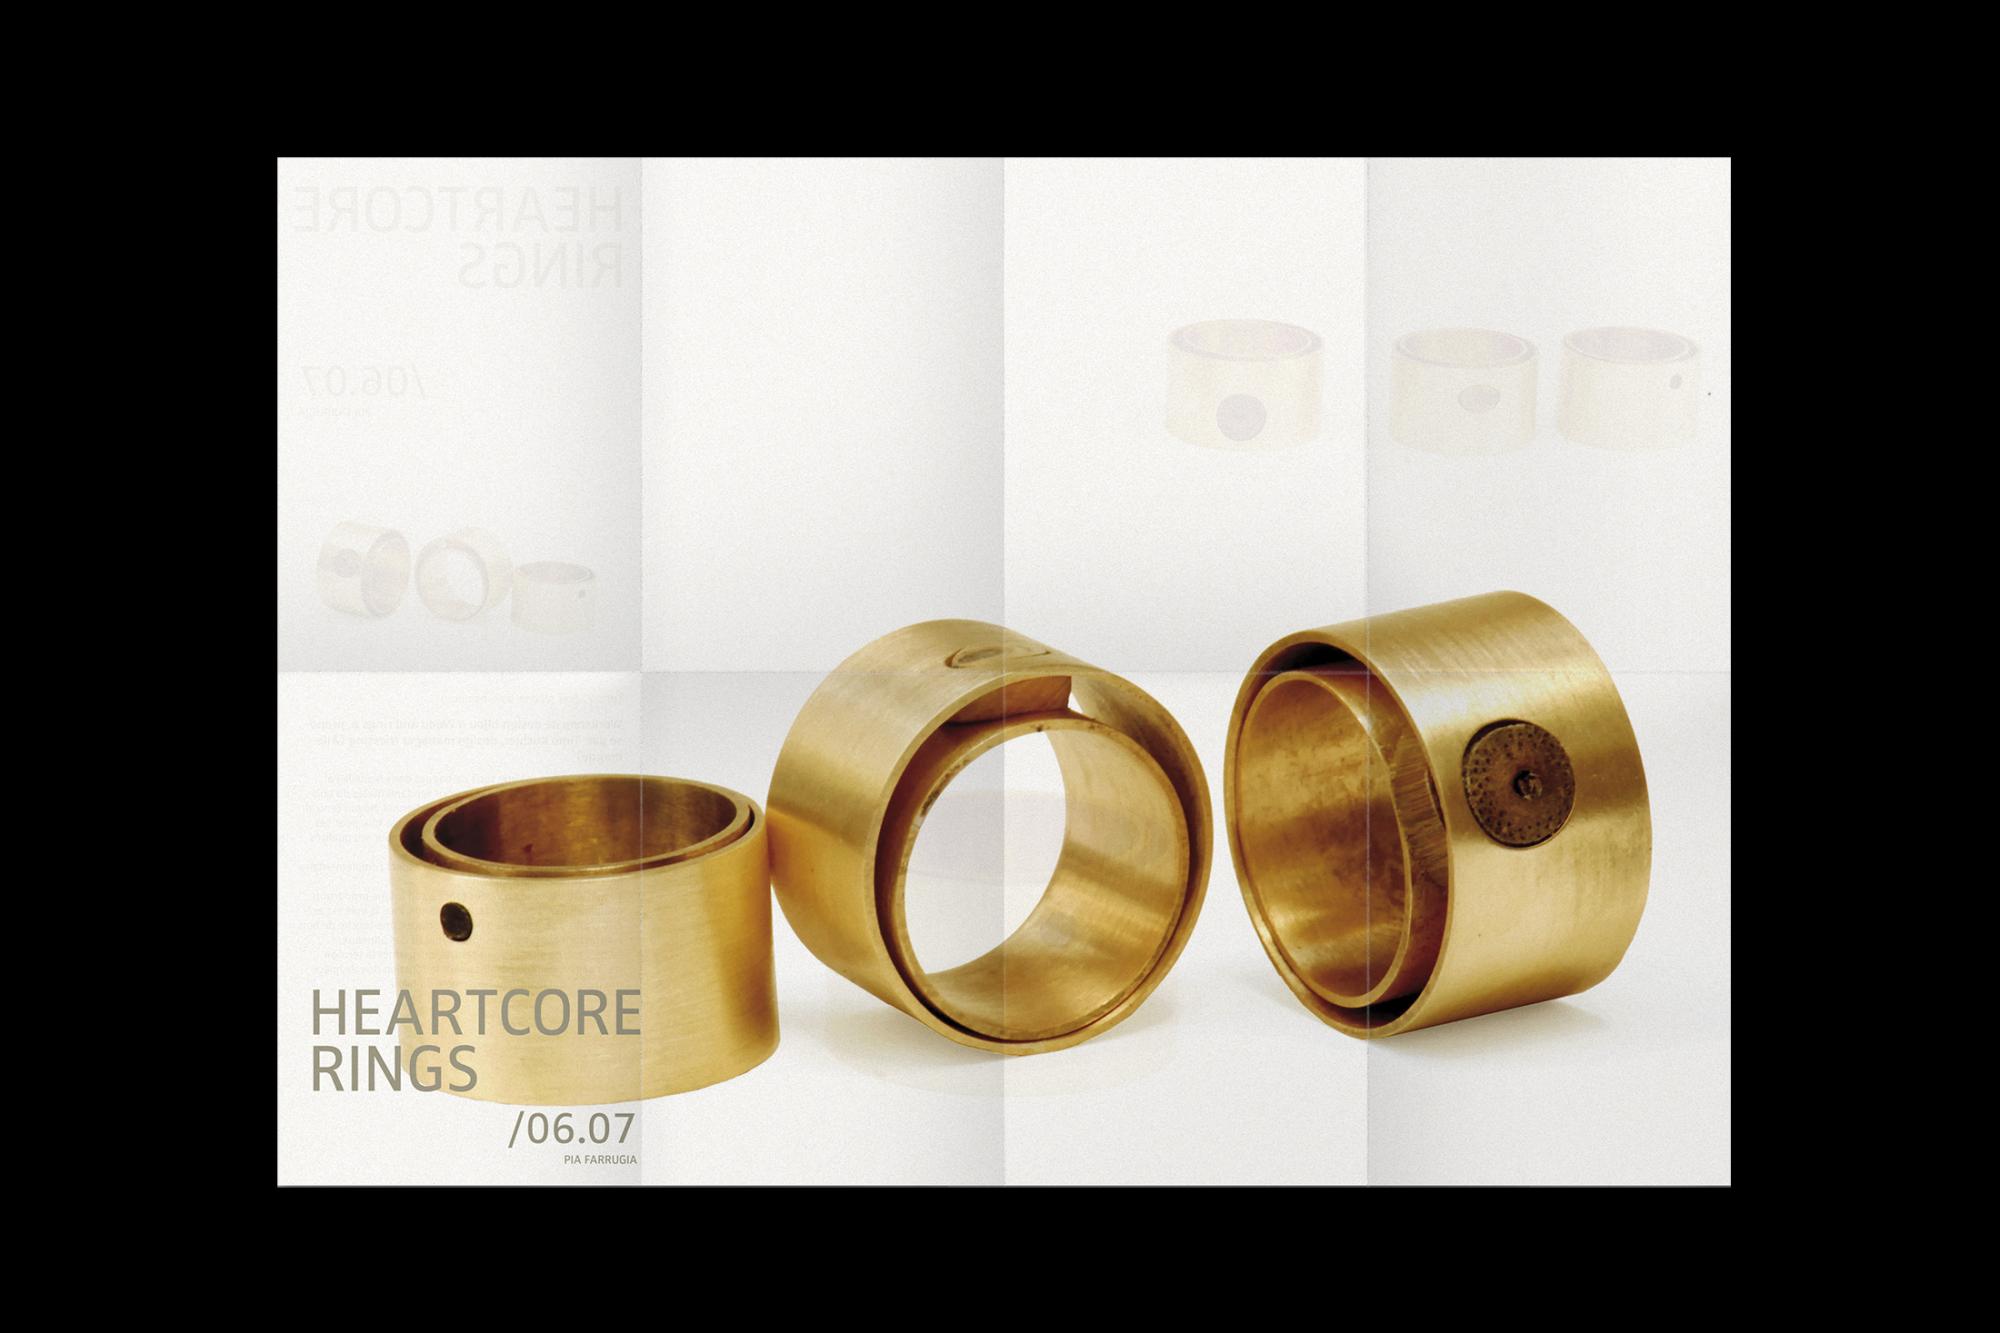 Graphisme Geneve graphic design graphique direction pia farrugia design bijou contemporain contemporary jewelry lookbook portfolio